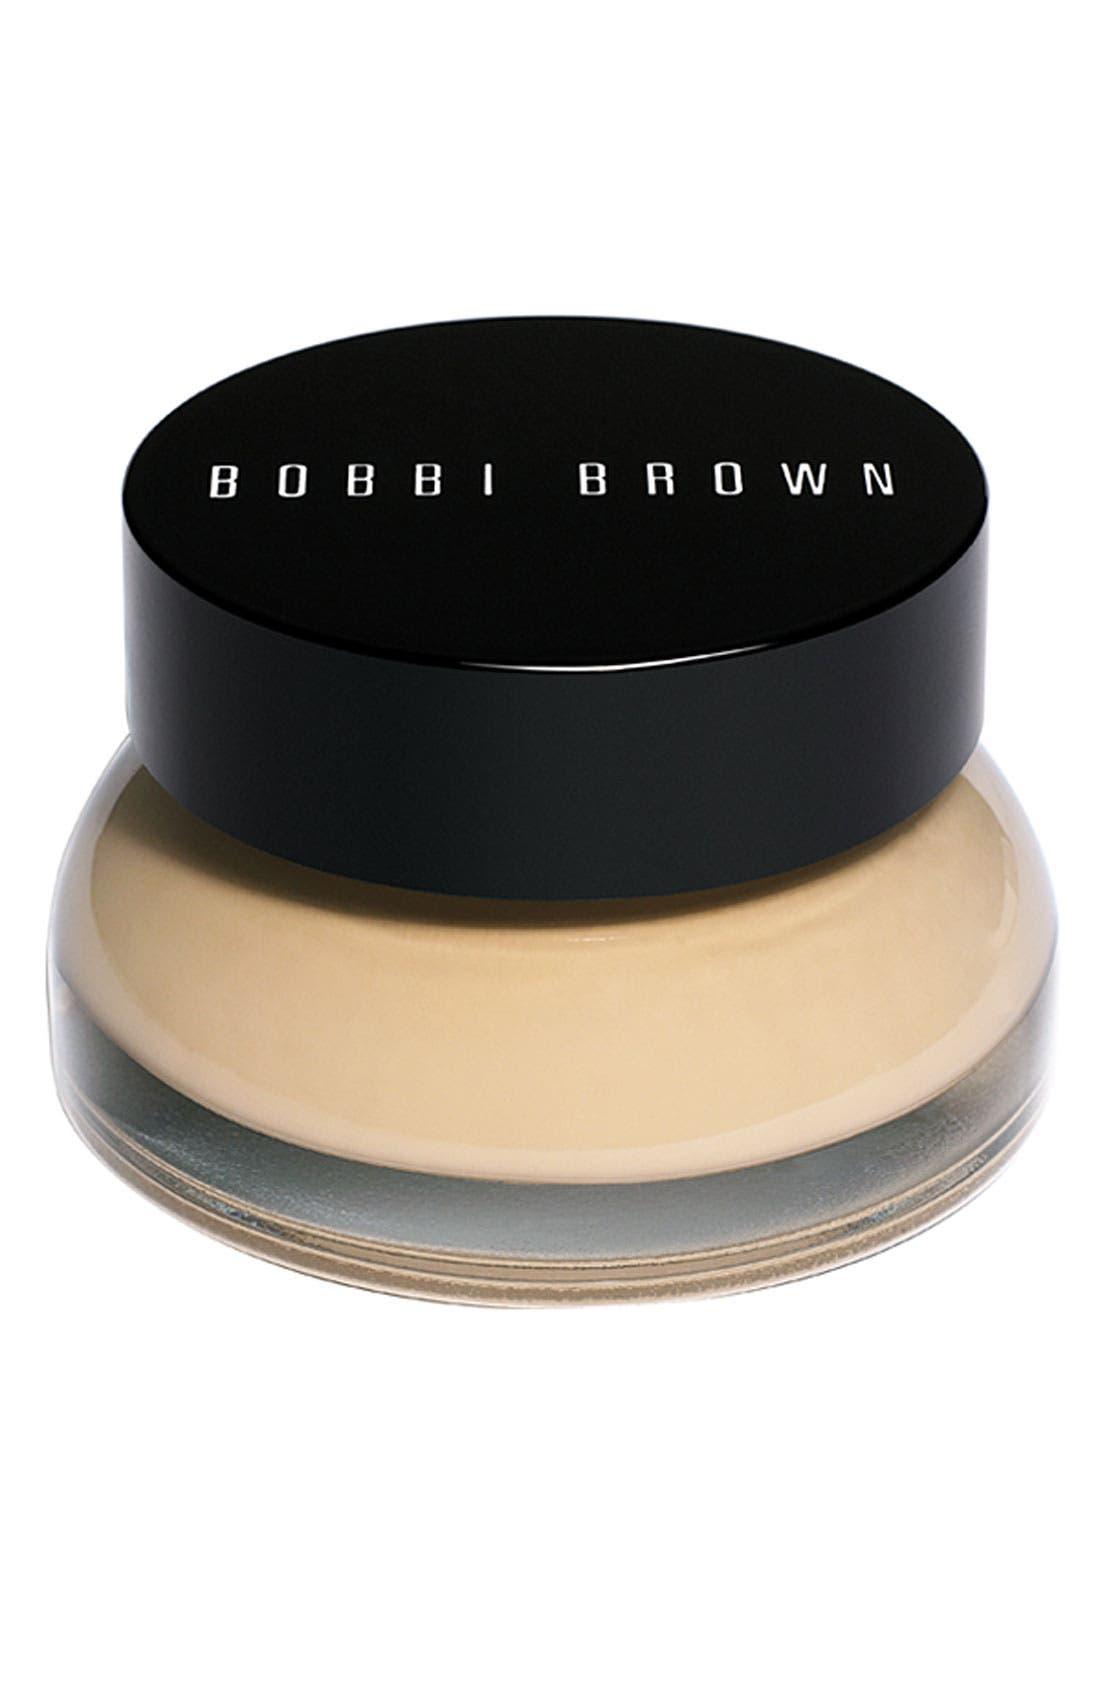 Bobbi Brown 'Extra' SPF 25 Tinted Moisturizing Balm